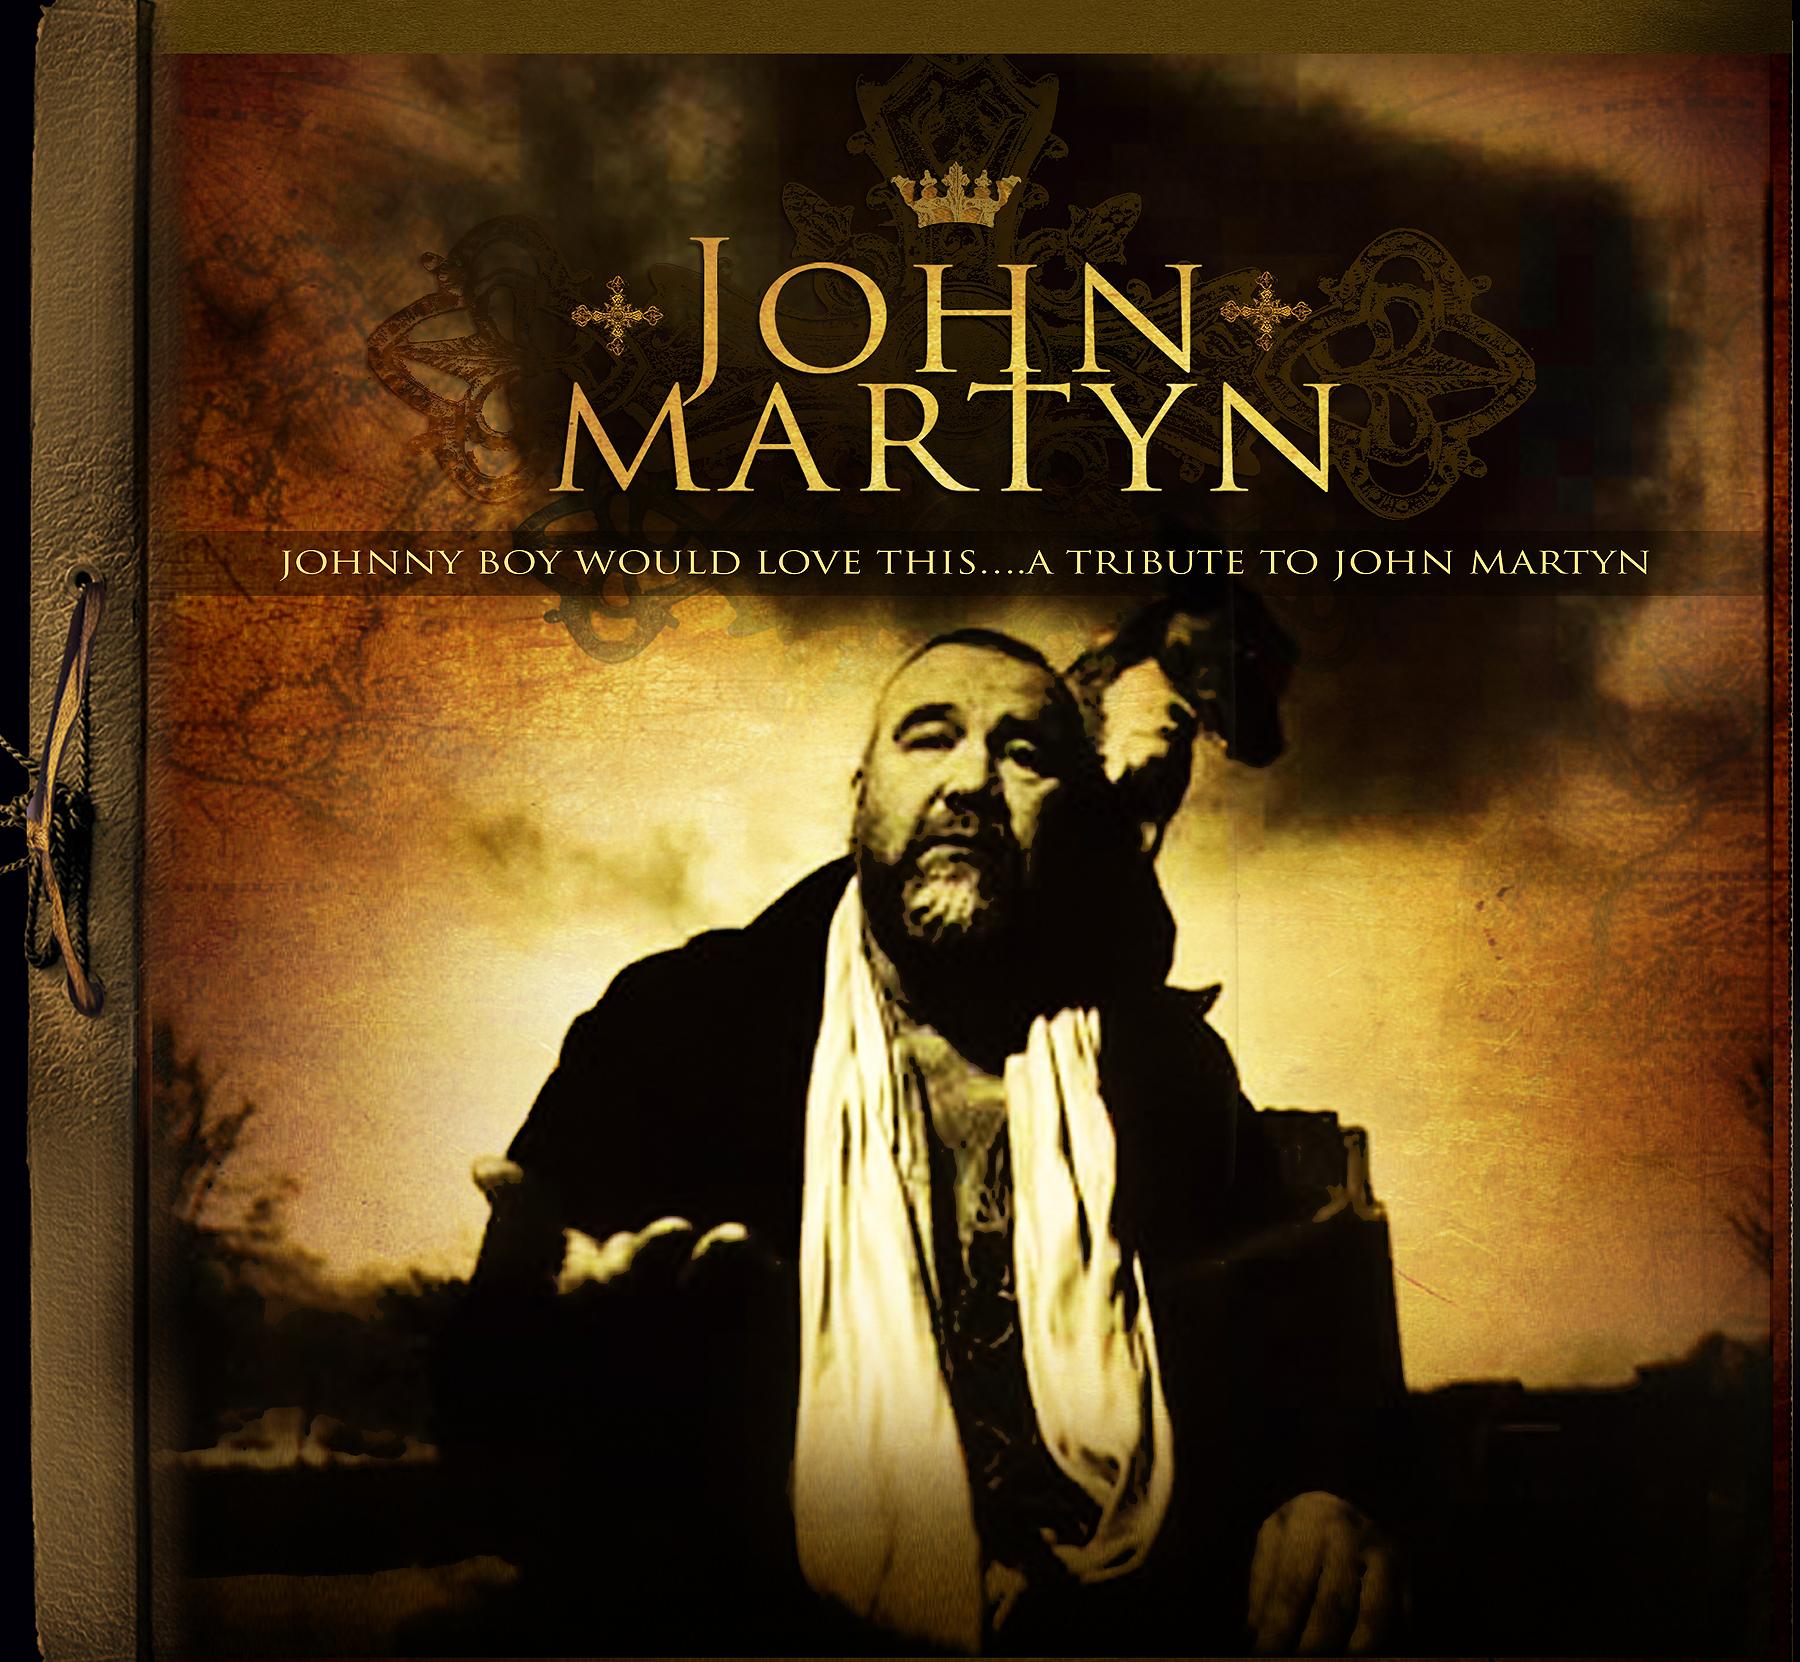 Beck Covers John Martyn